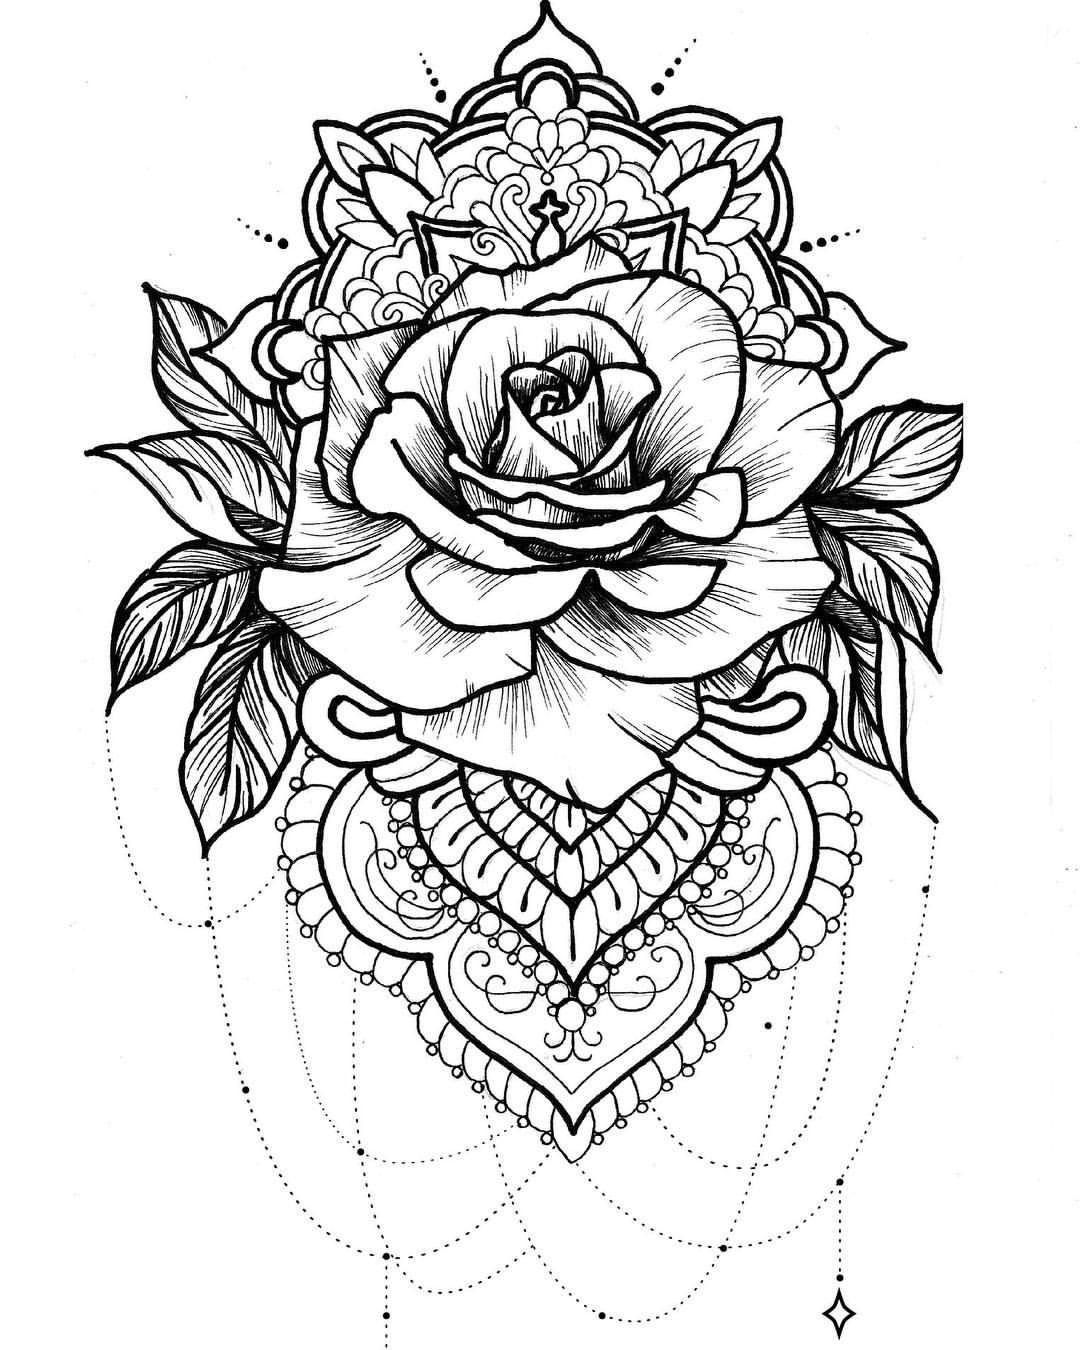 Rose Mandala Tattoo : mandala, tattoo, Ночной, эскиз, #роза, #рисую, #эскиз, #мандала, #тлт, #тату, #цветок, #rose, #flower, Mandala, #tattoo, #tattoopins, #tatts, #drawing, #r…, Tattoos,, Sleeve, Tattoos